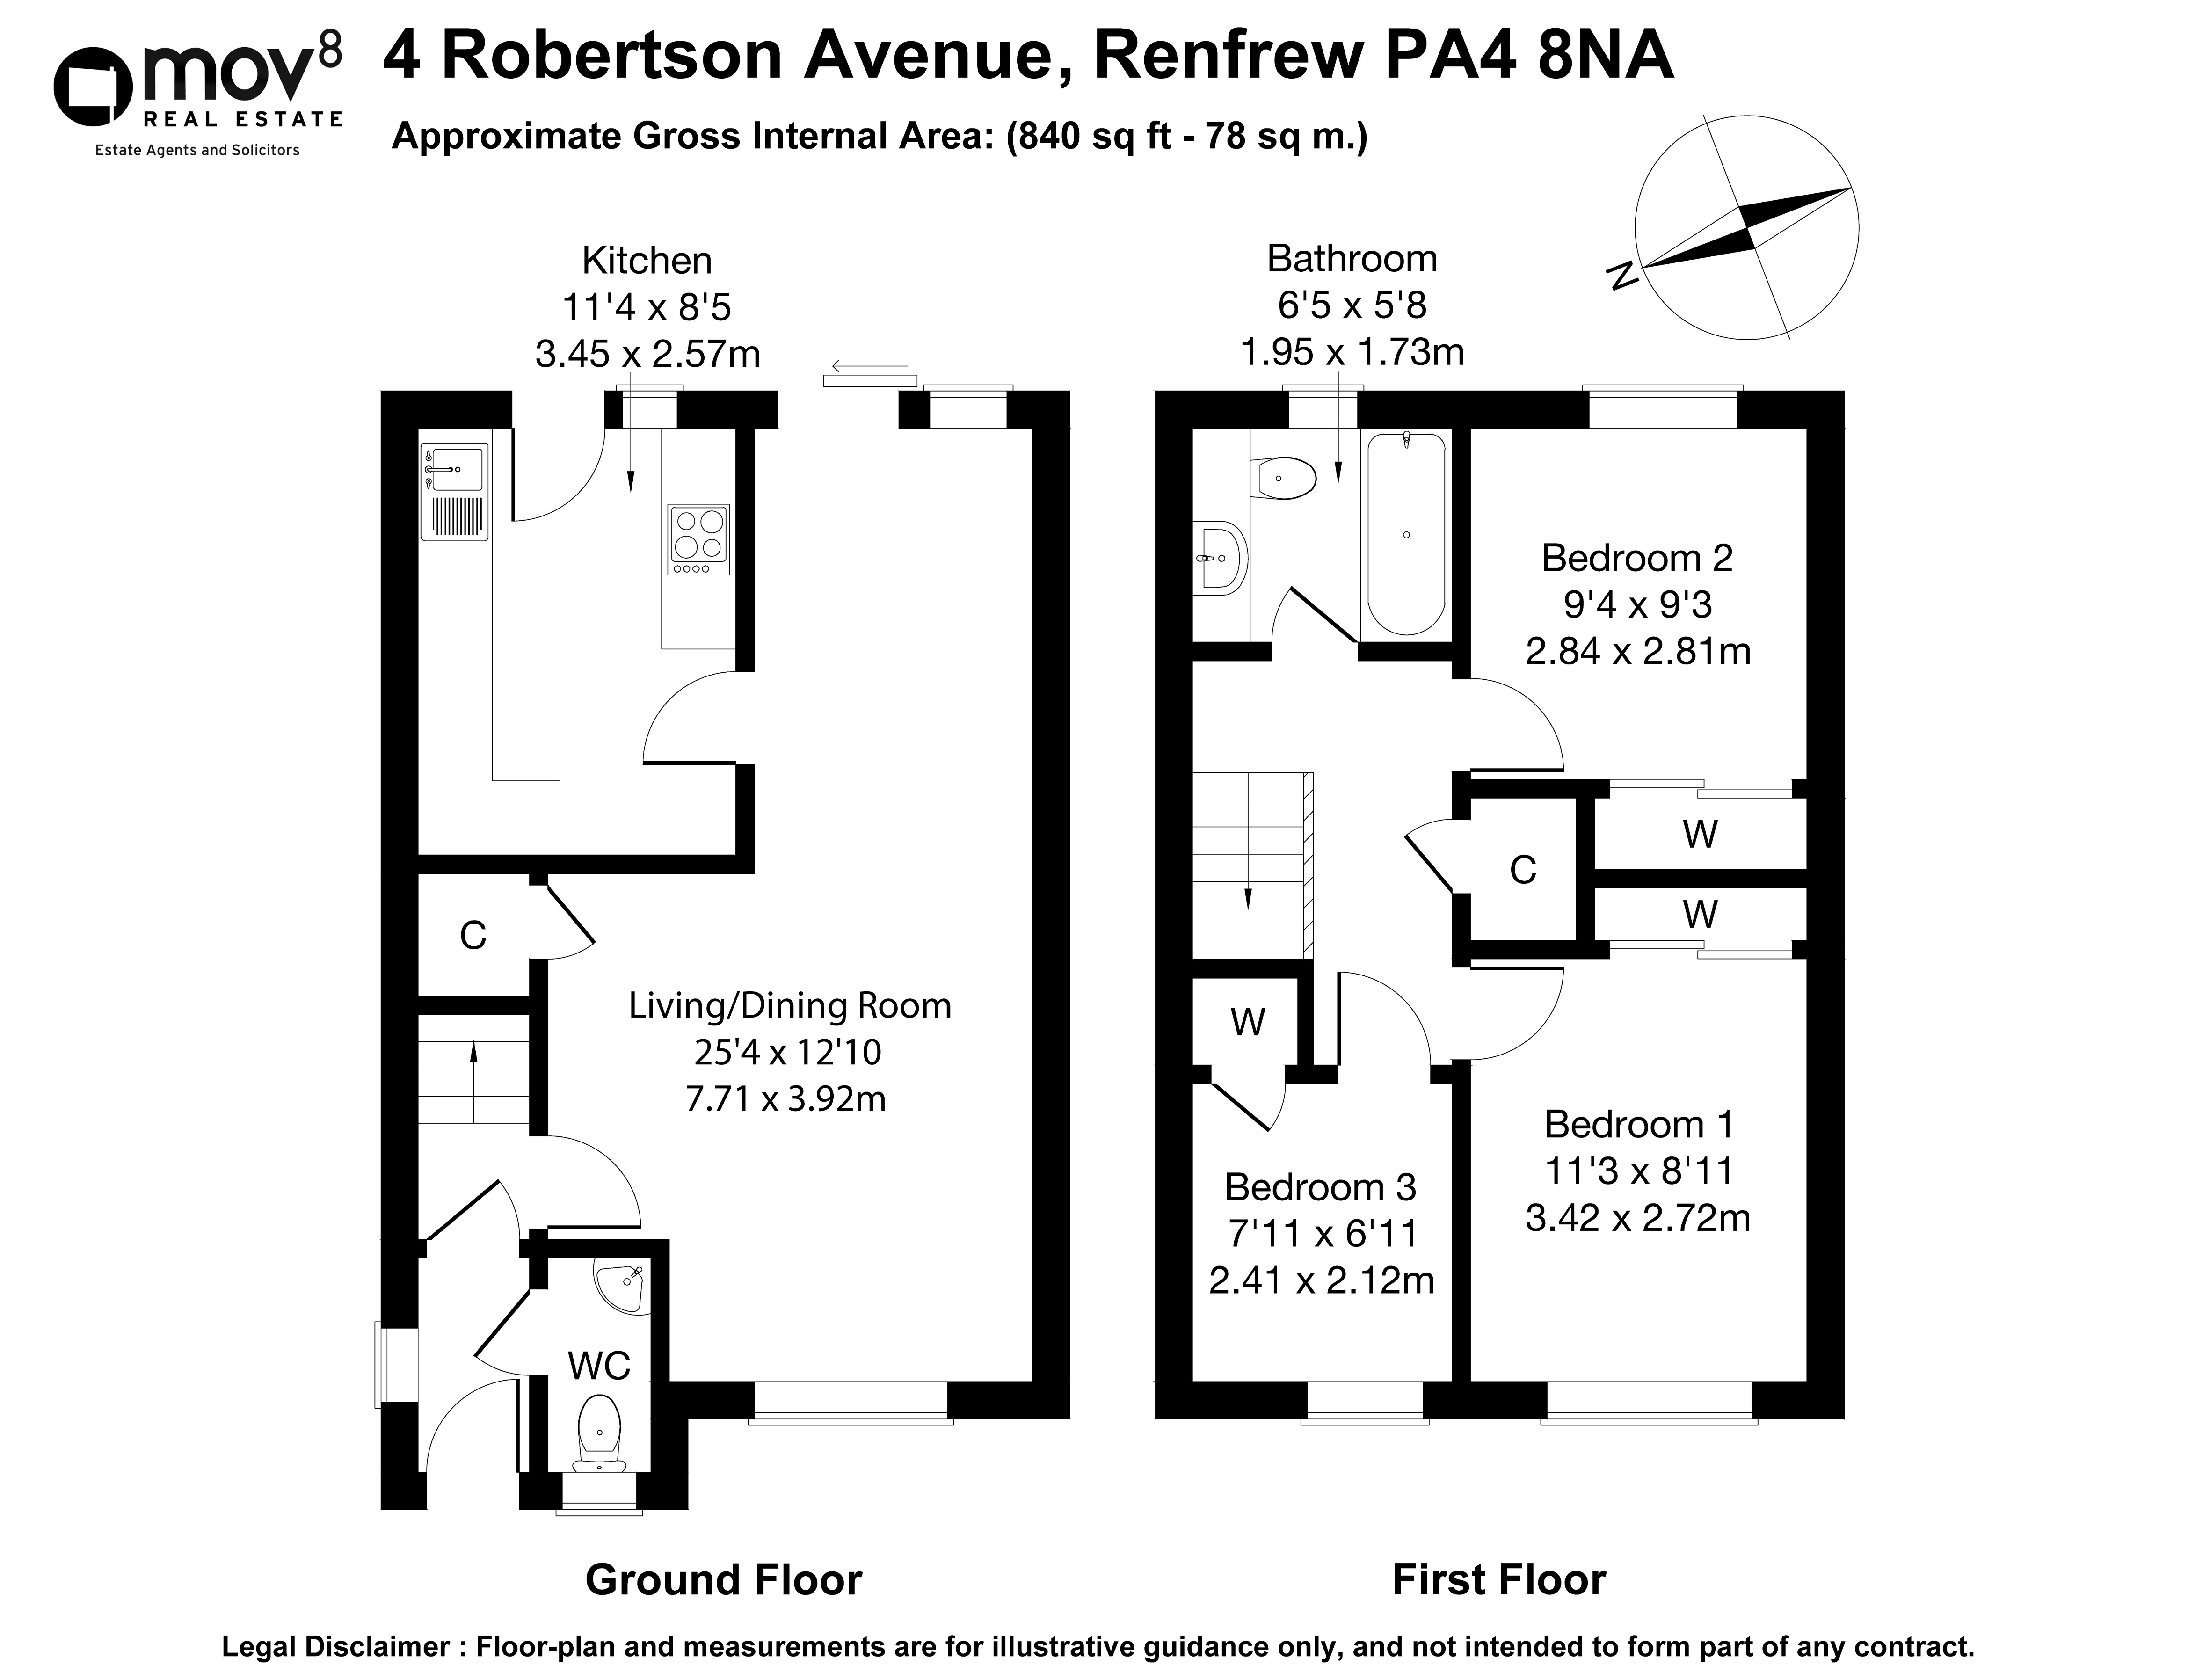 Floorplan 1 of 4 Robertson Avenue, Renfrew, PA4 8NA